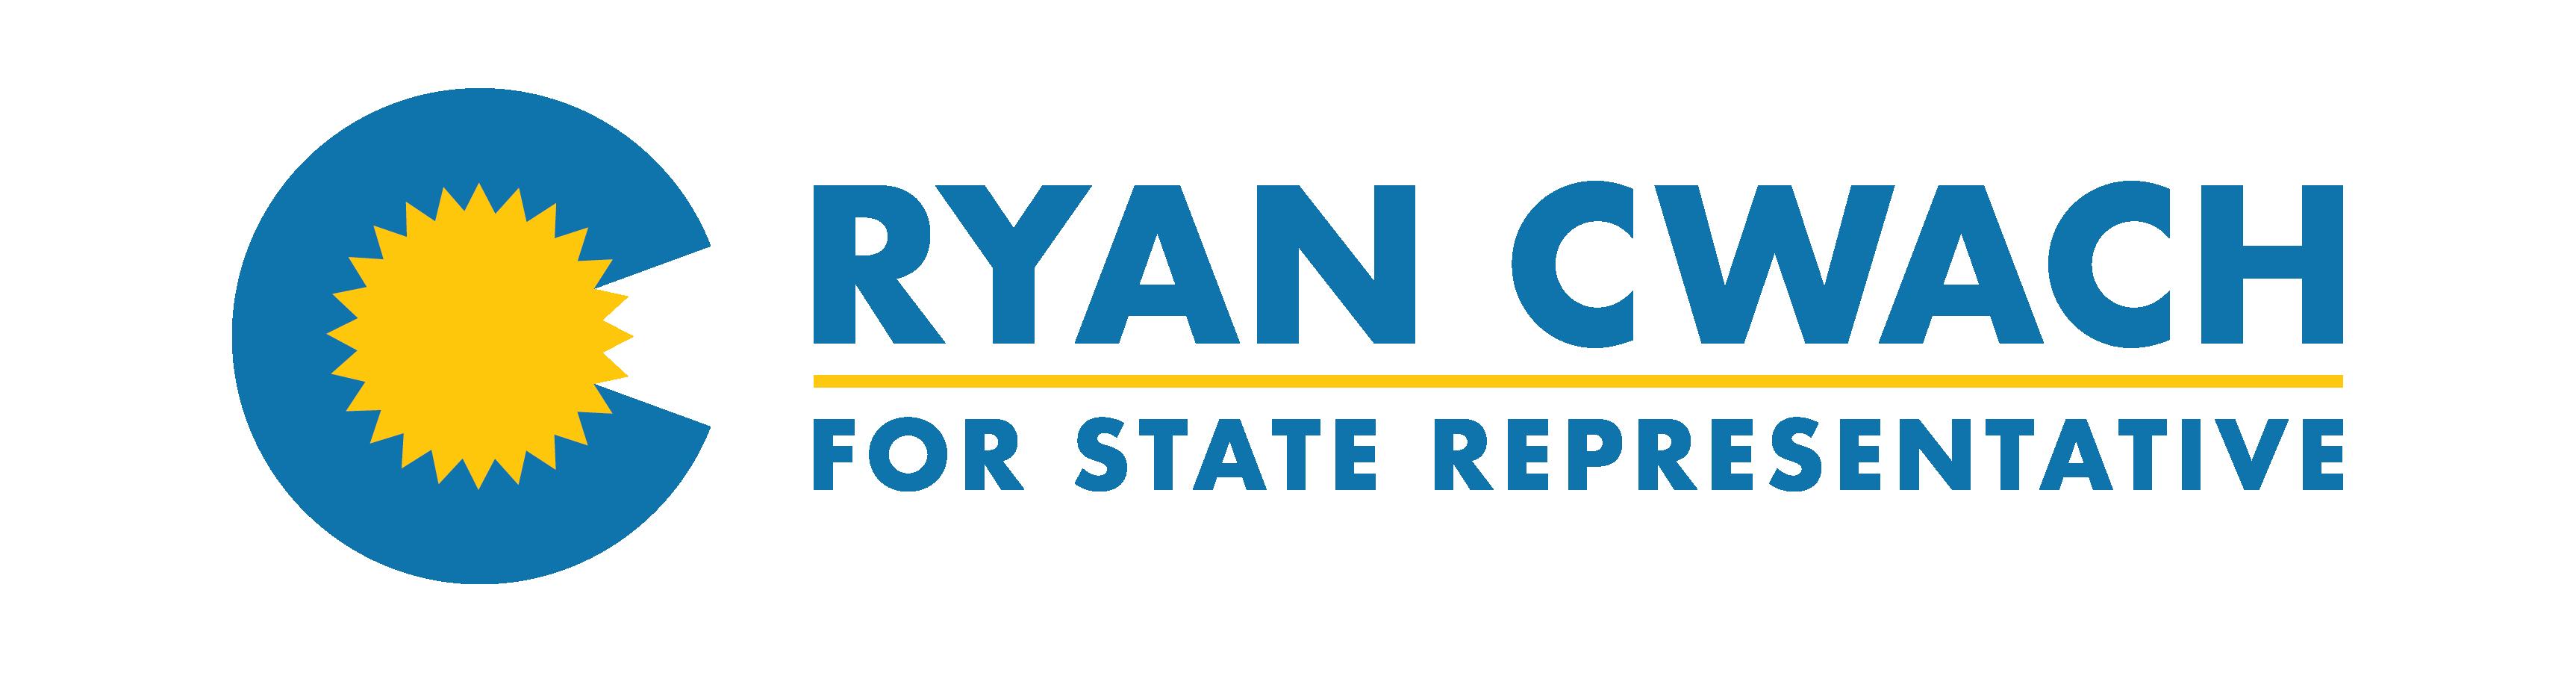 Ryan Cwach